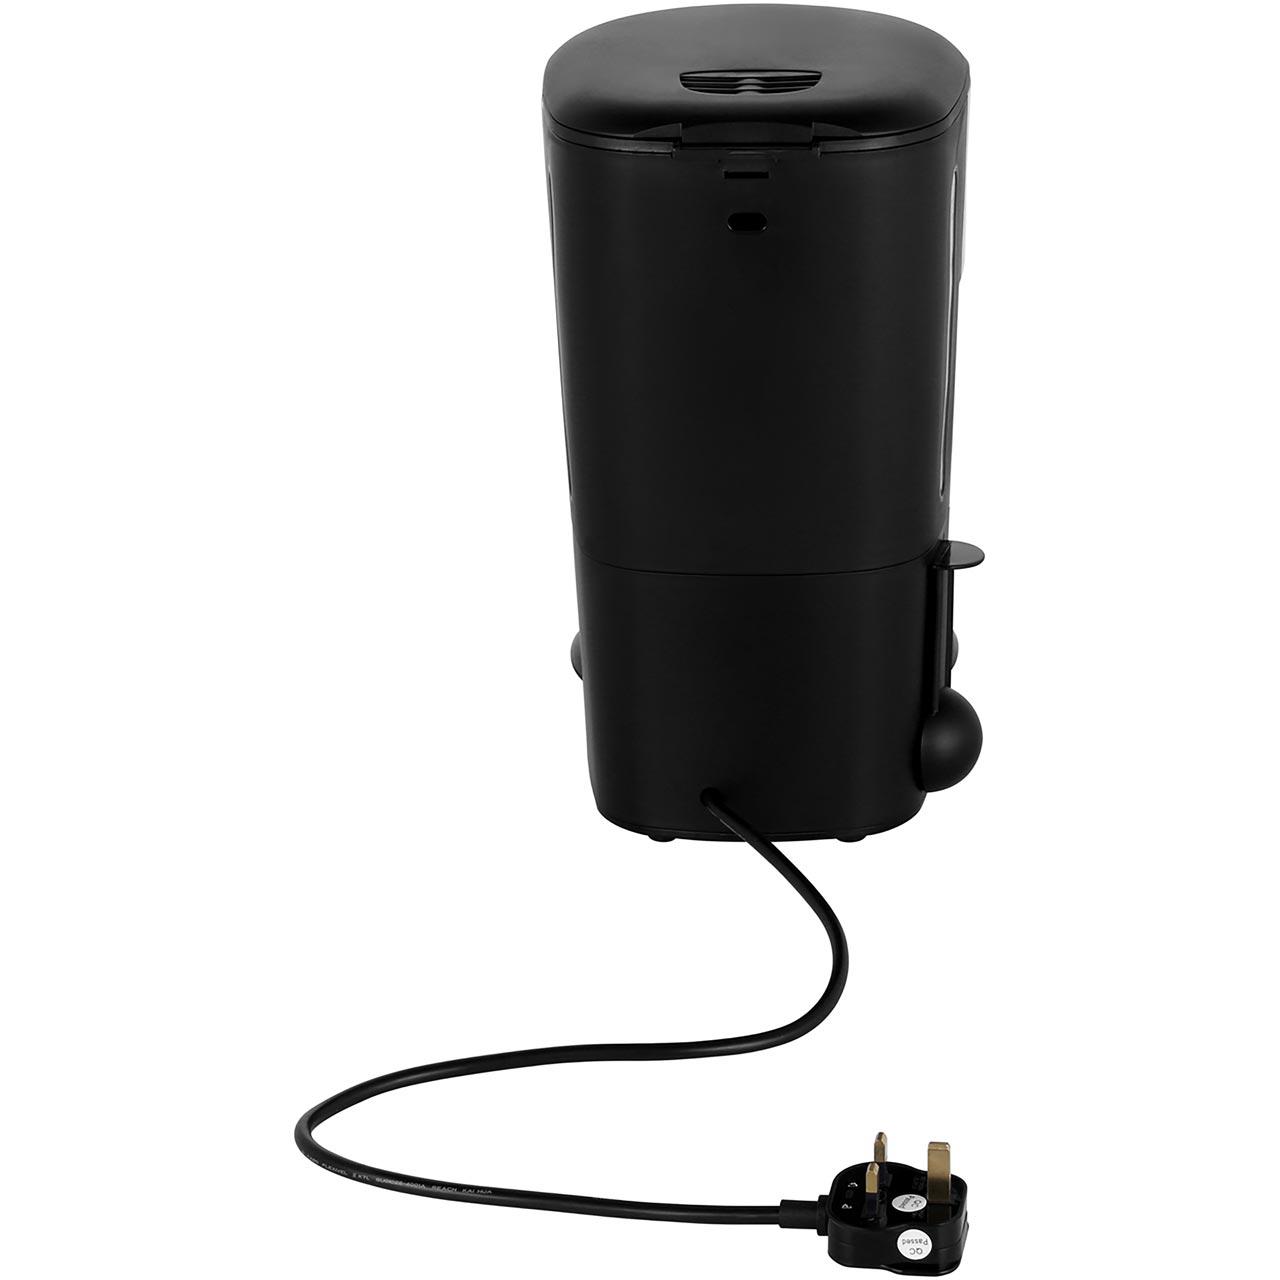 20680 Bk Russell Hobbs Filter Coffee Machine Fuel Filters